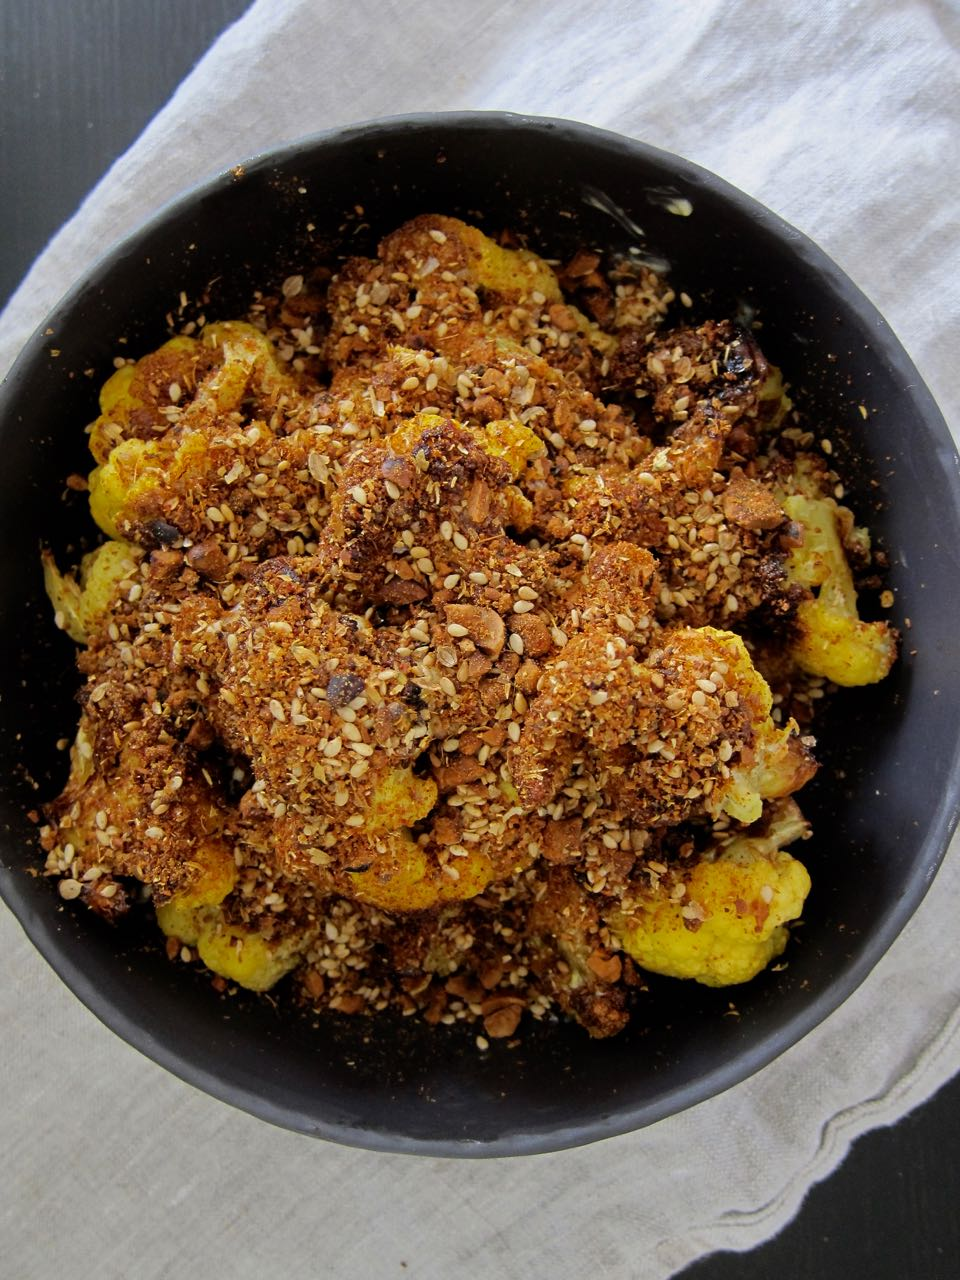 Fried Cauliflower with Homemade Dukkah